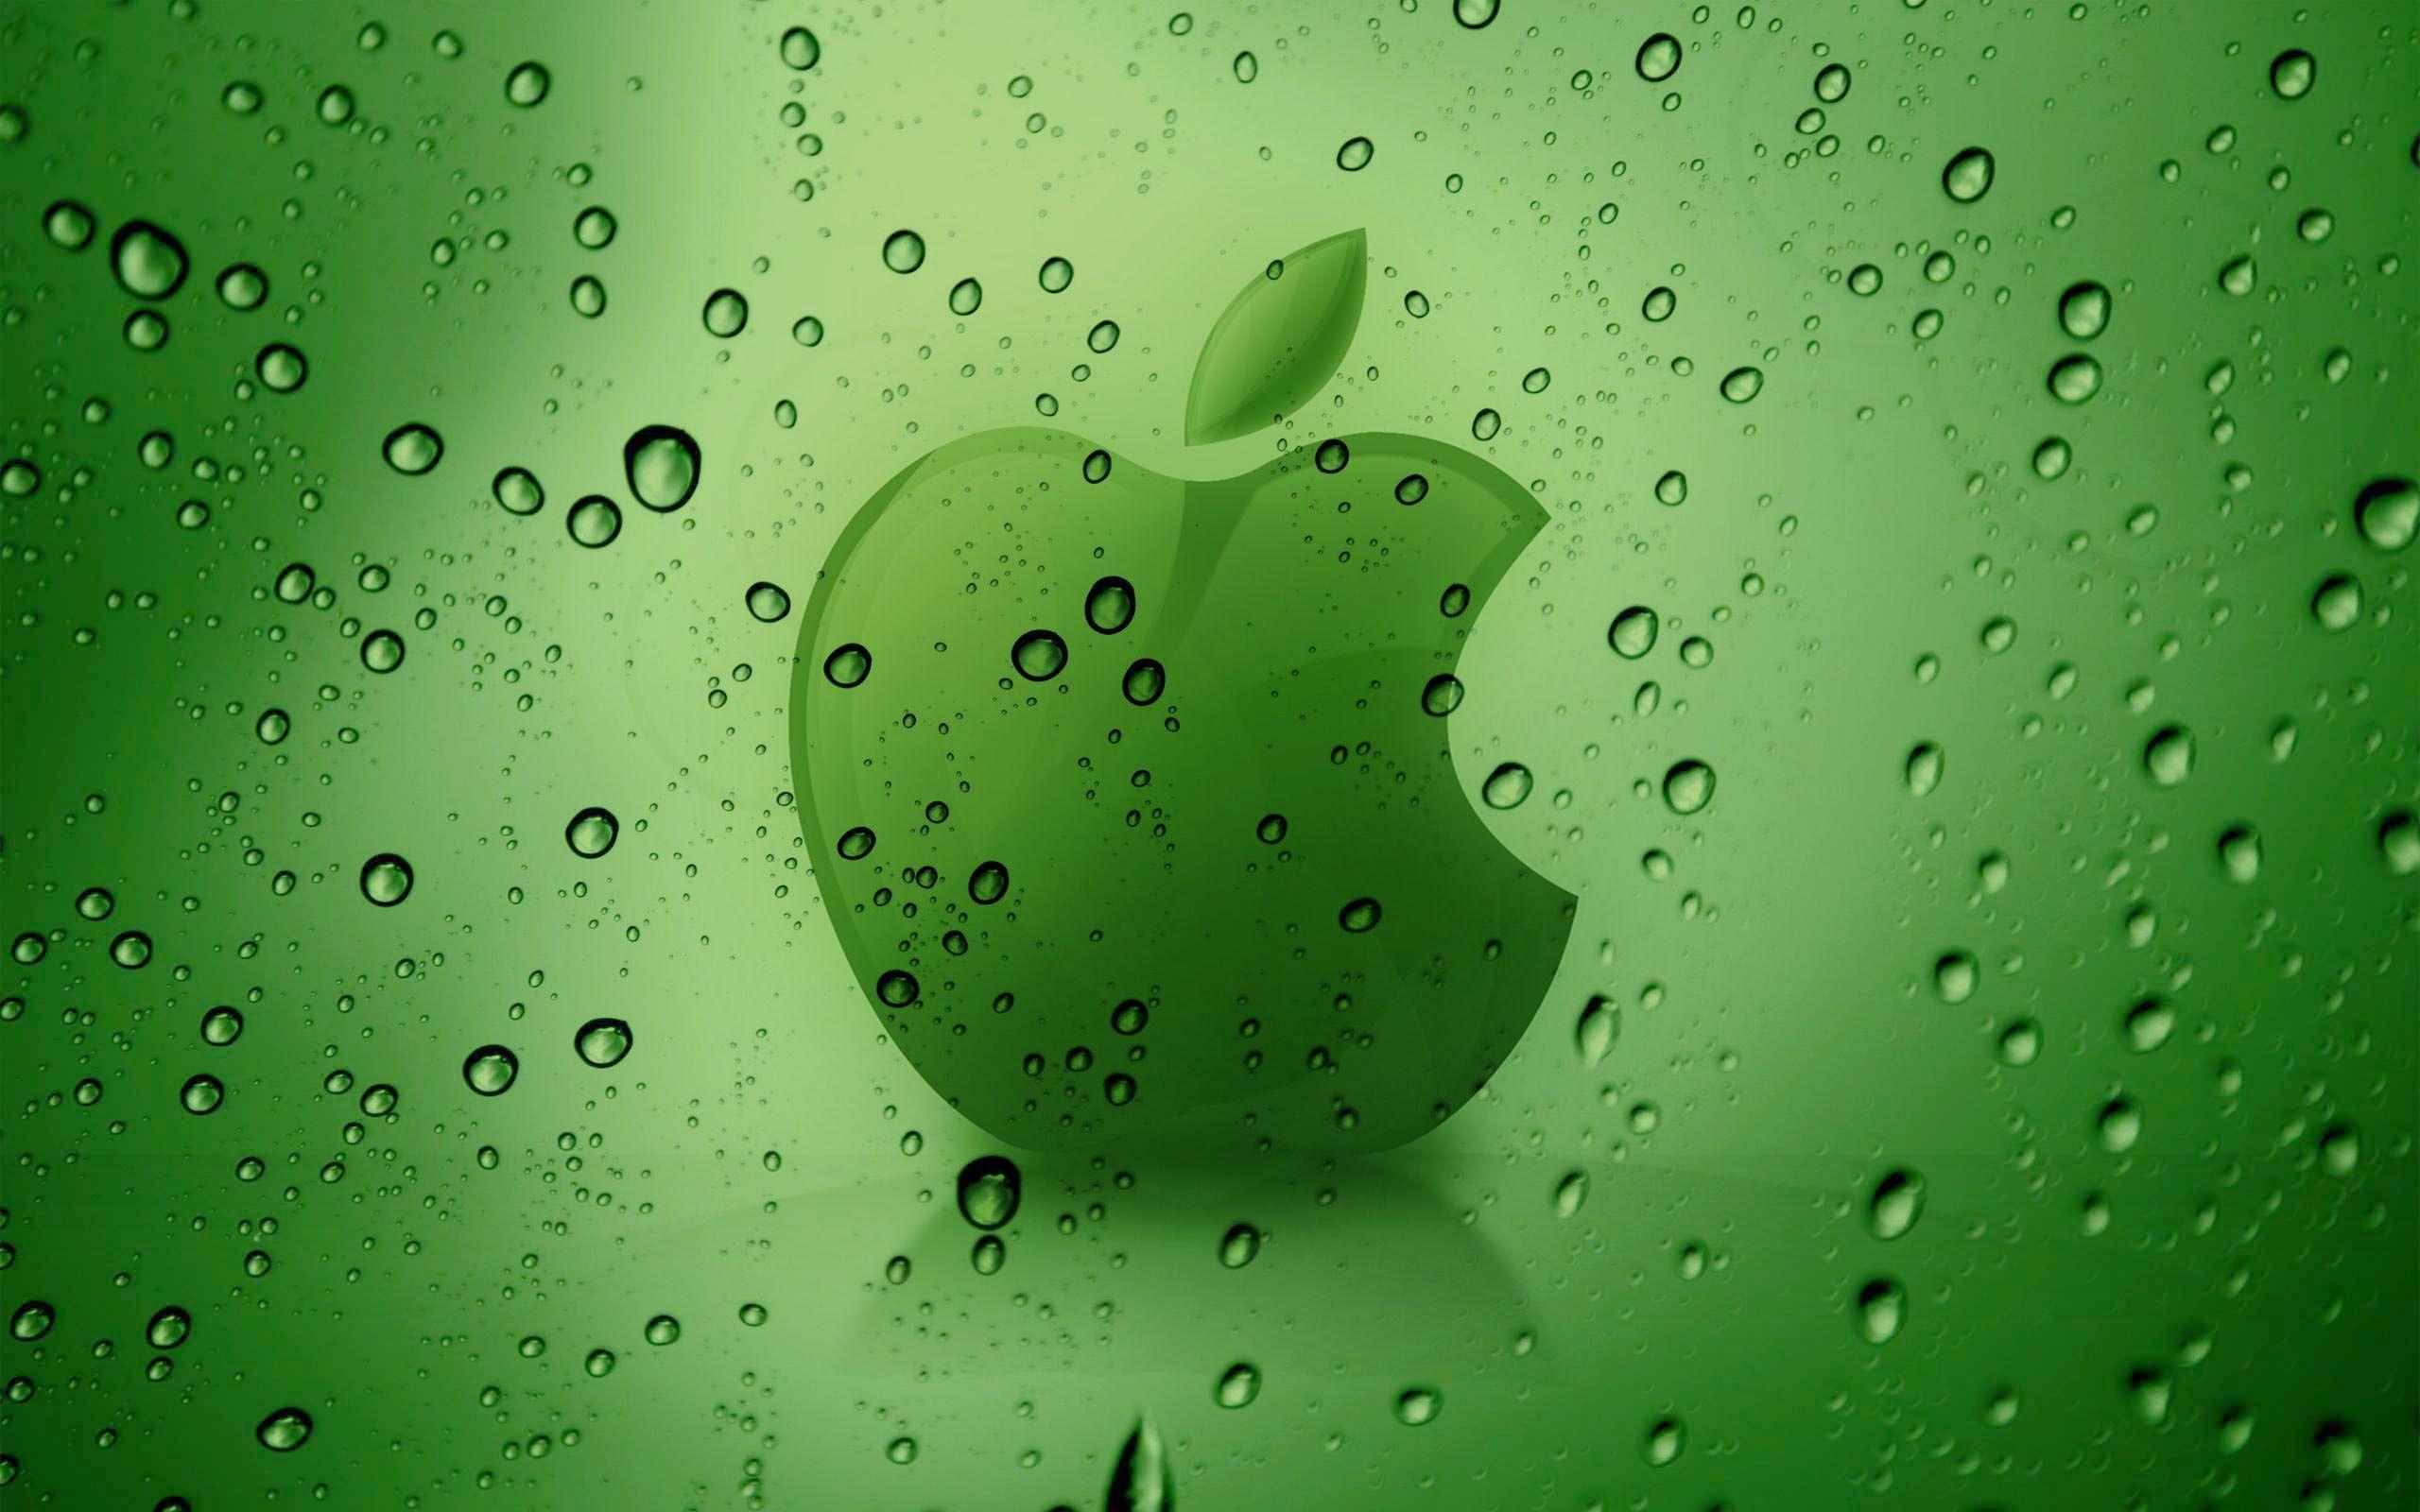 Wallpaper download apple - Green Apple Wallpapers 1080p Hd Wallpapers Inn